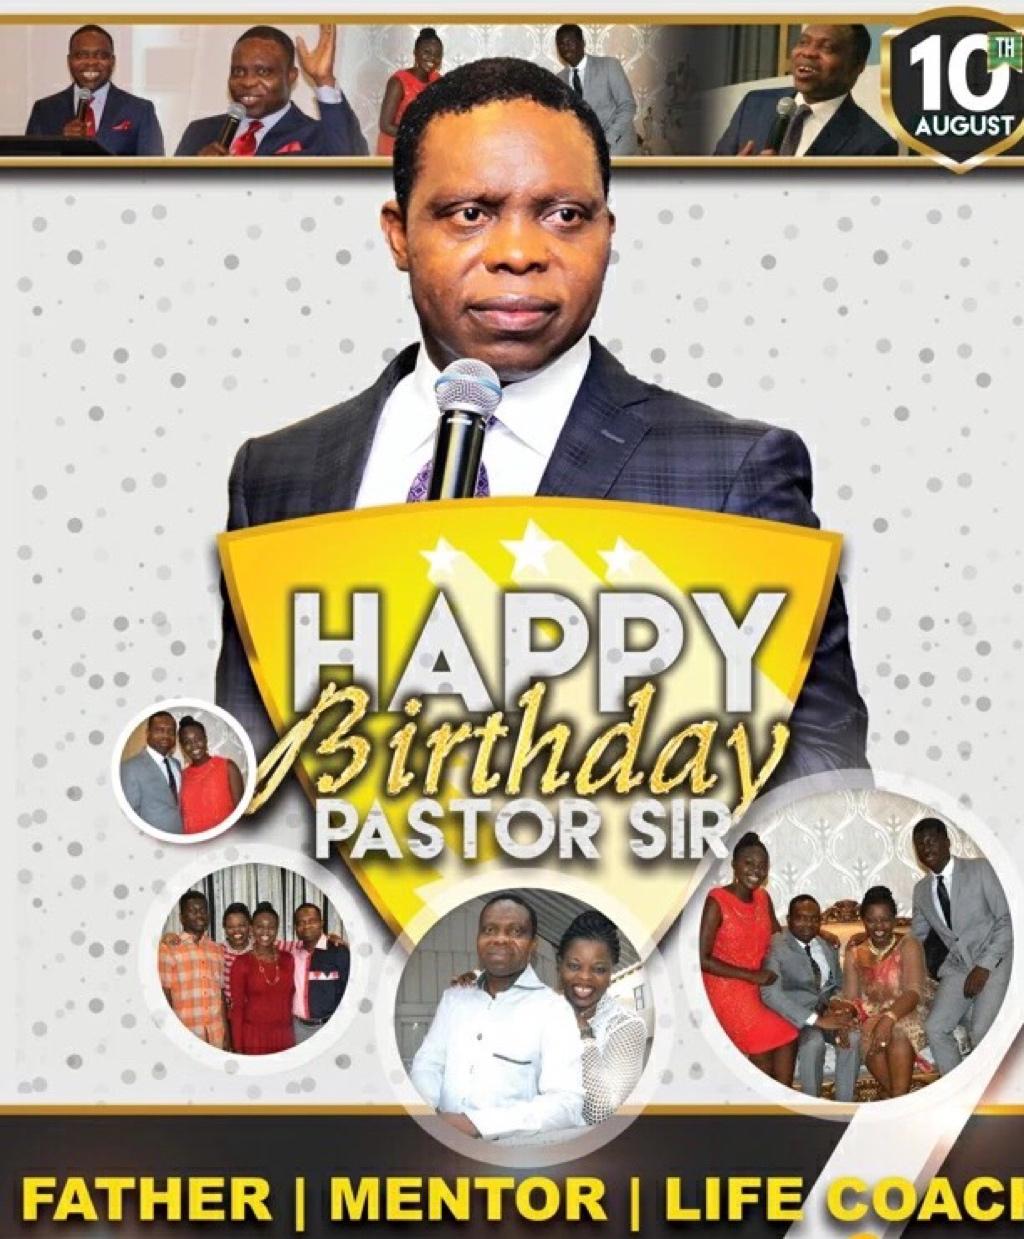 Happy Birthday Pastor Law, i